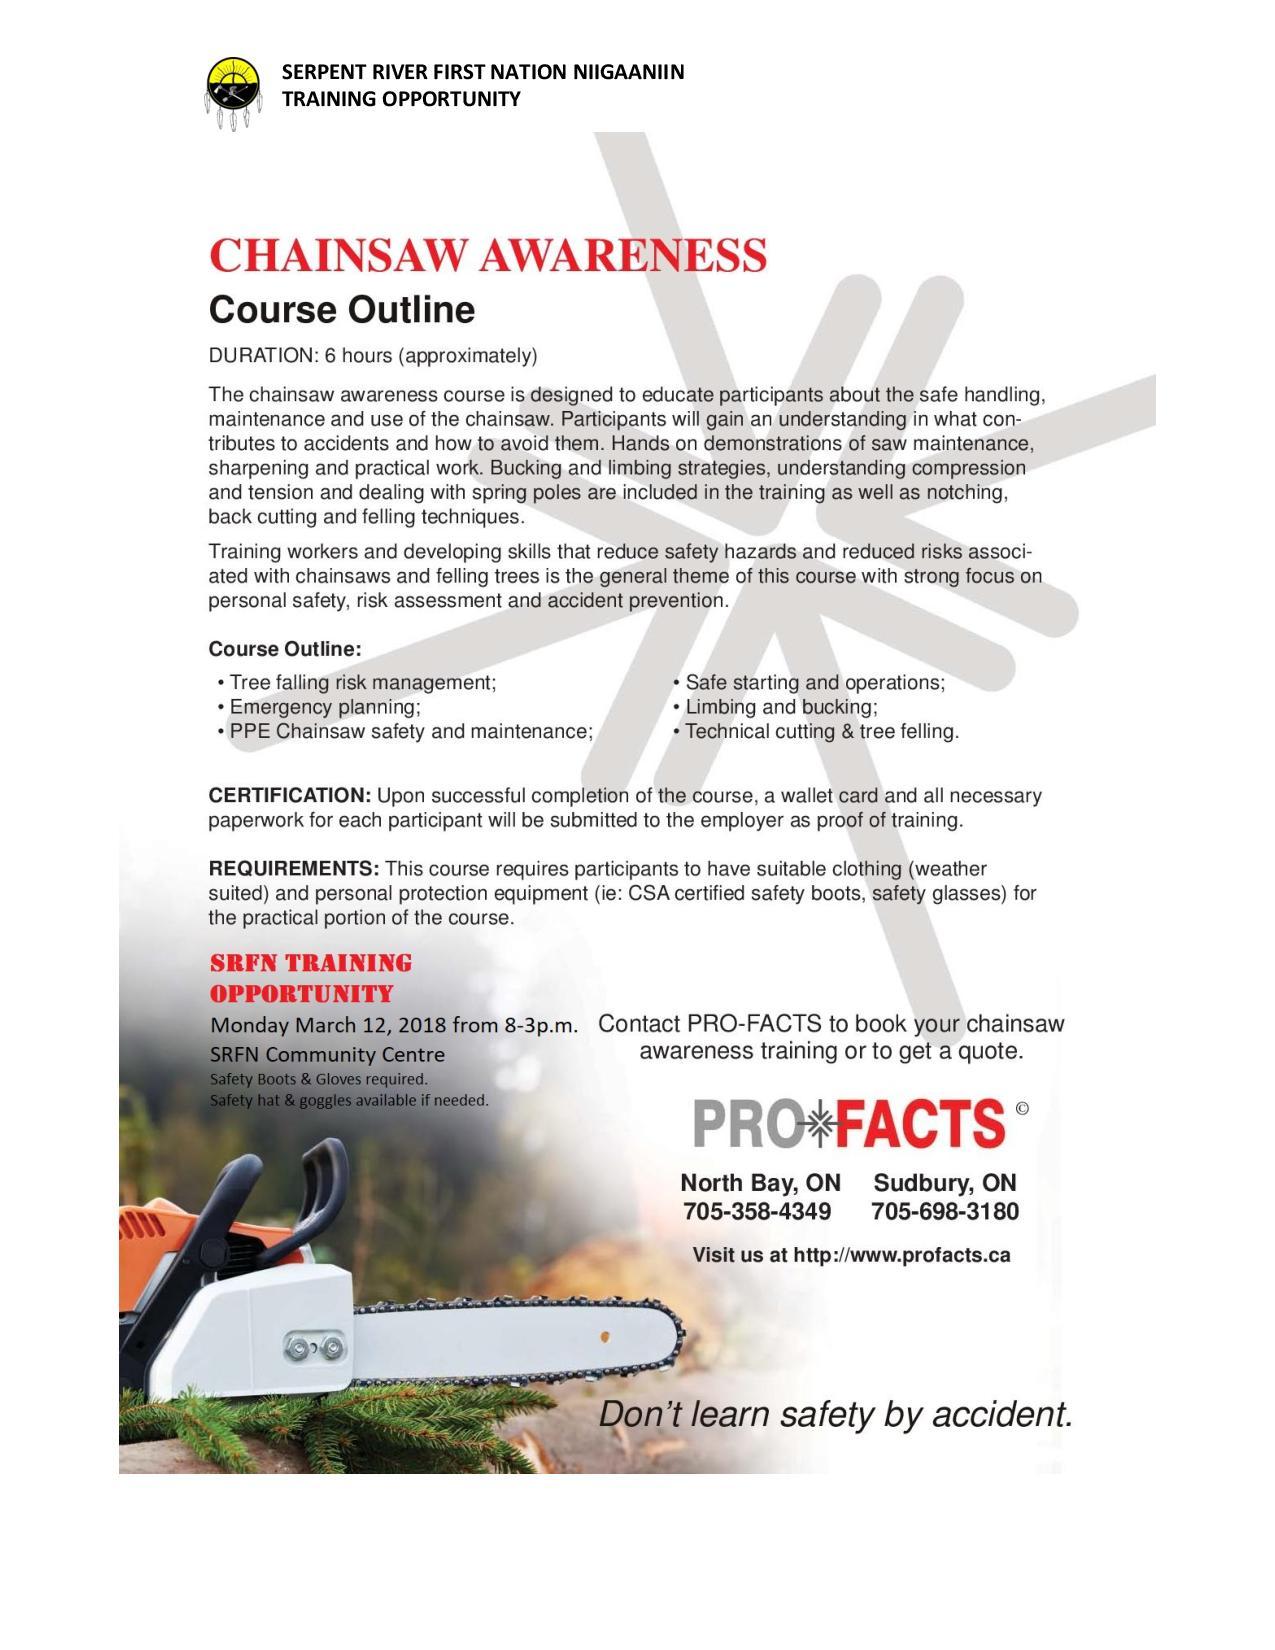 2018-03-12 Niigaaniin Training OP - Chainsaw Safety Course-page-001.jpg